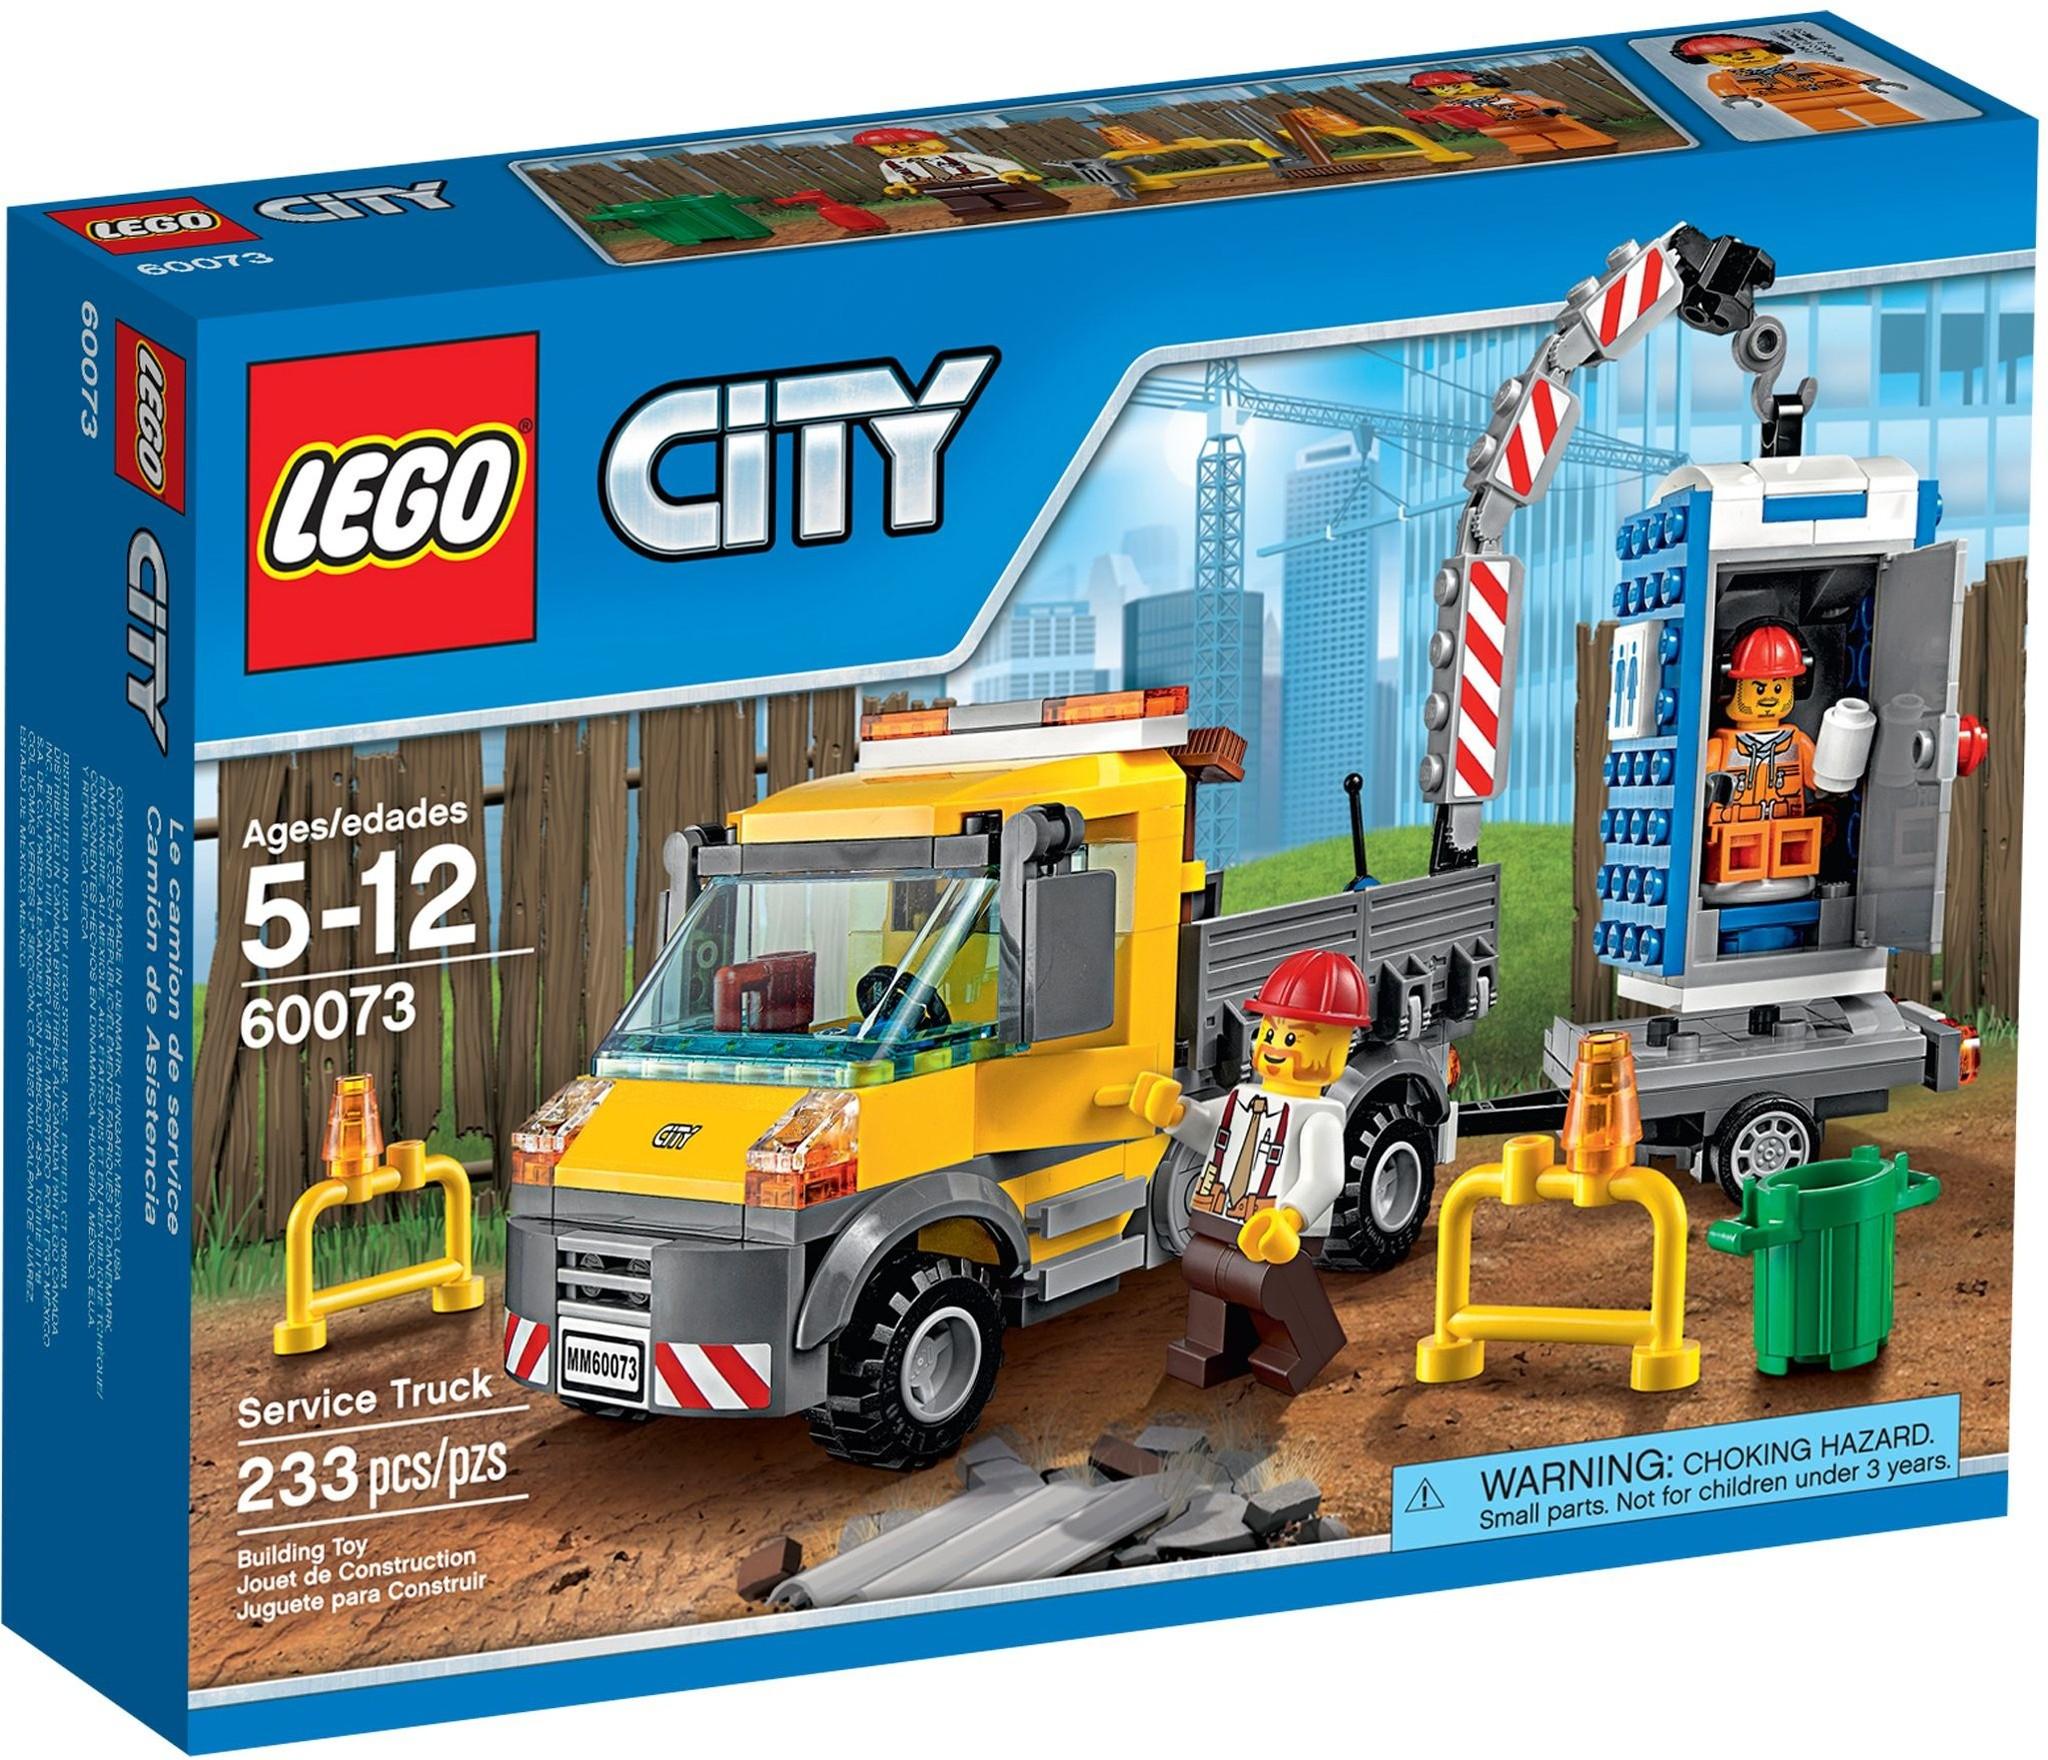 LEGO 60073 - City - Service Truck